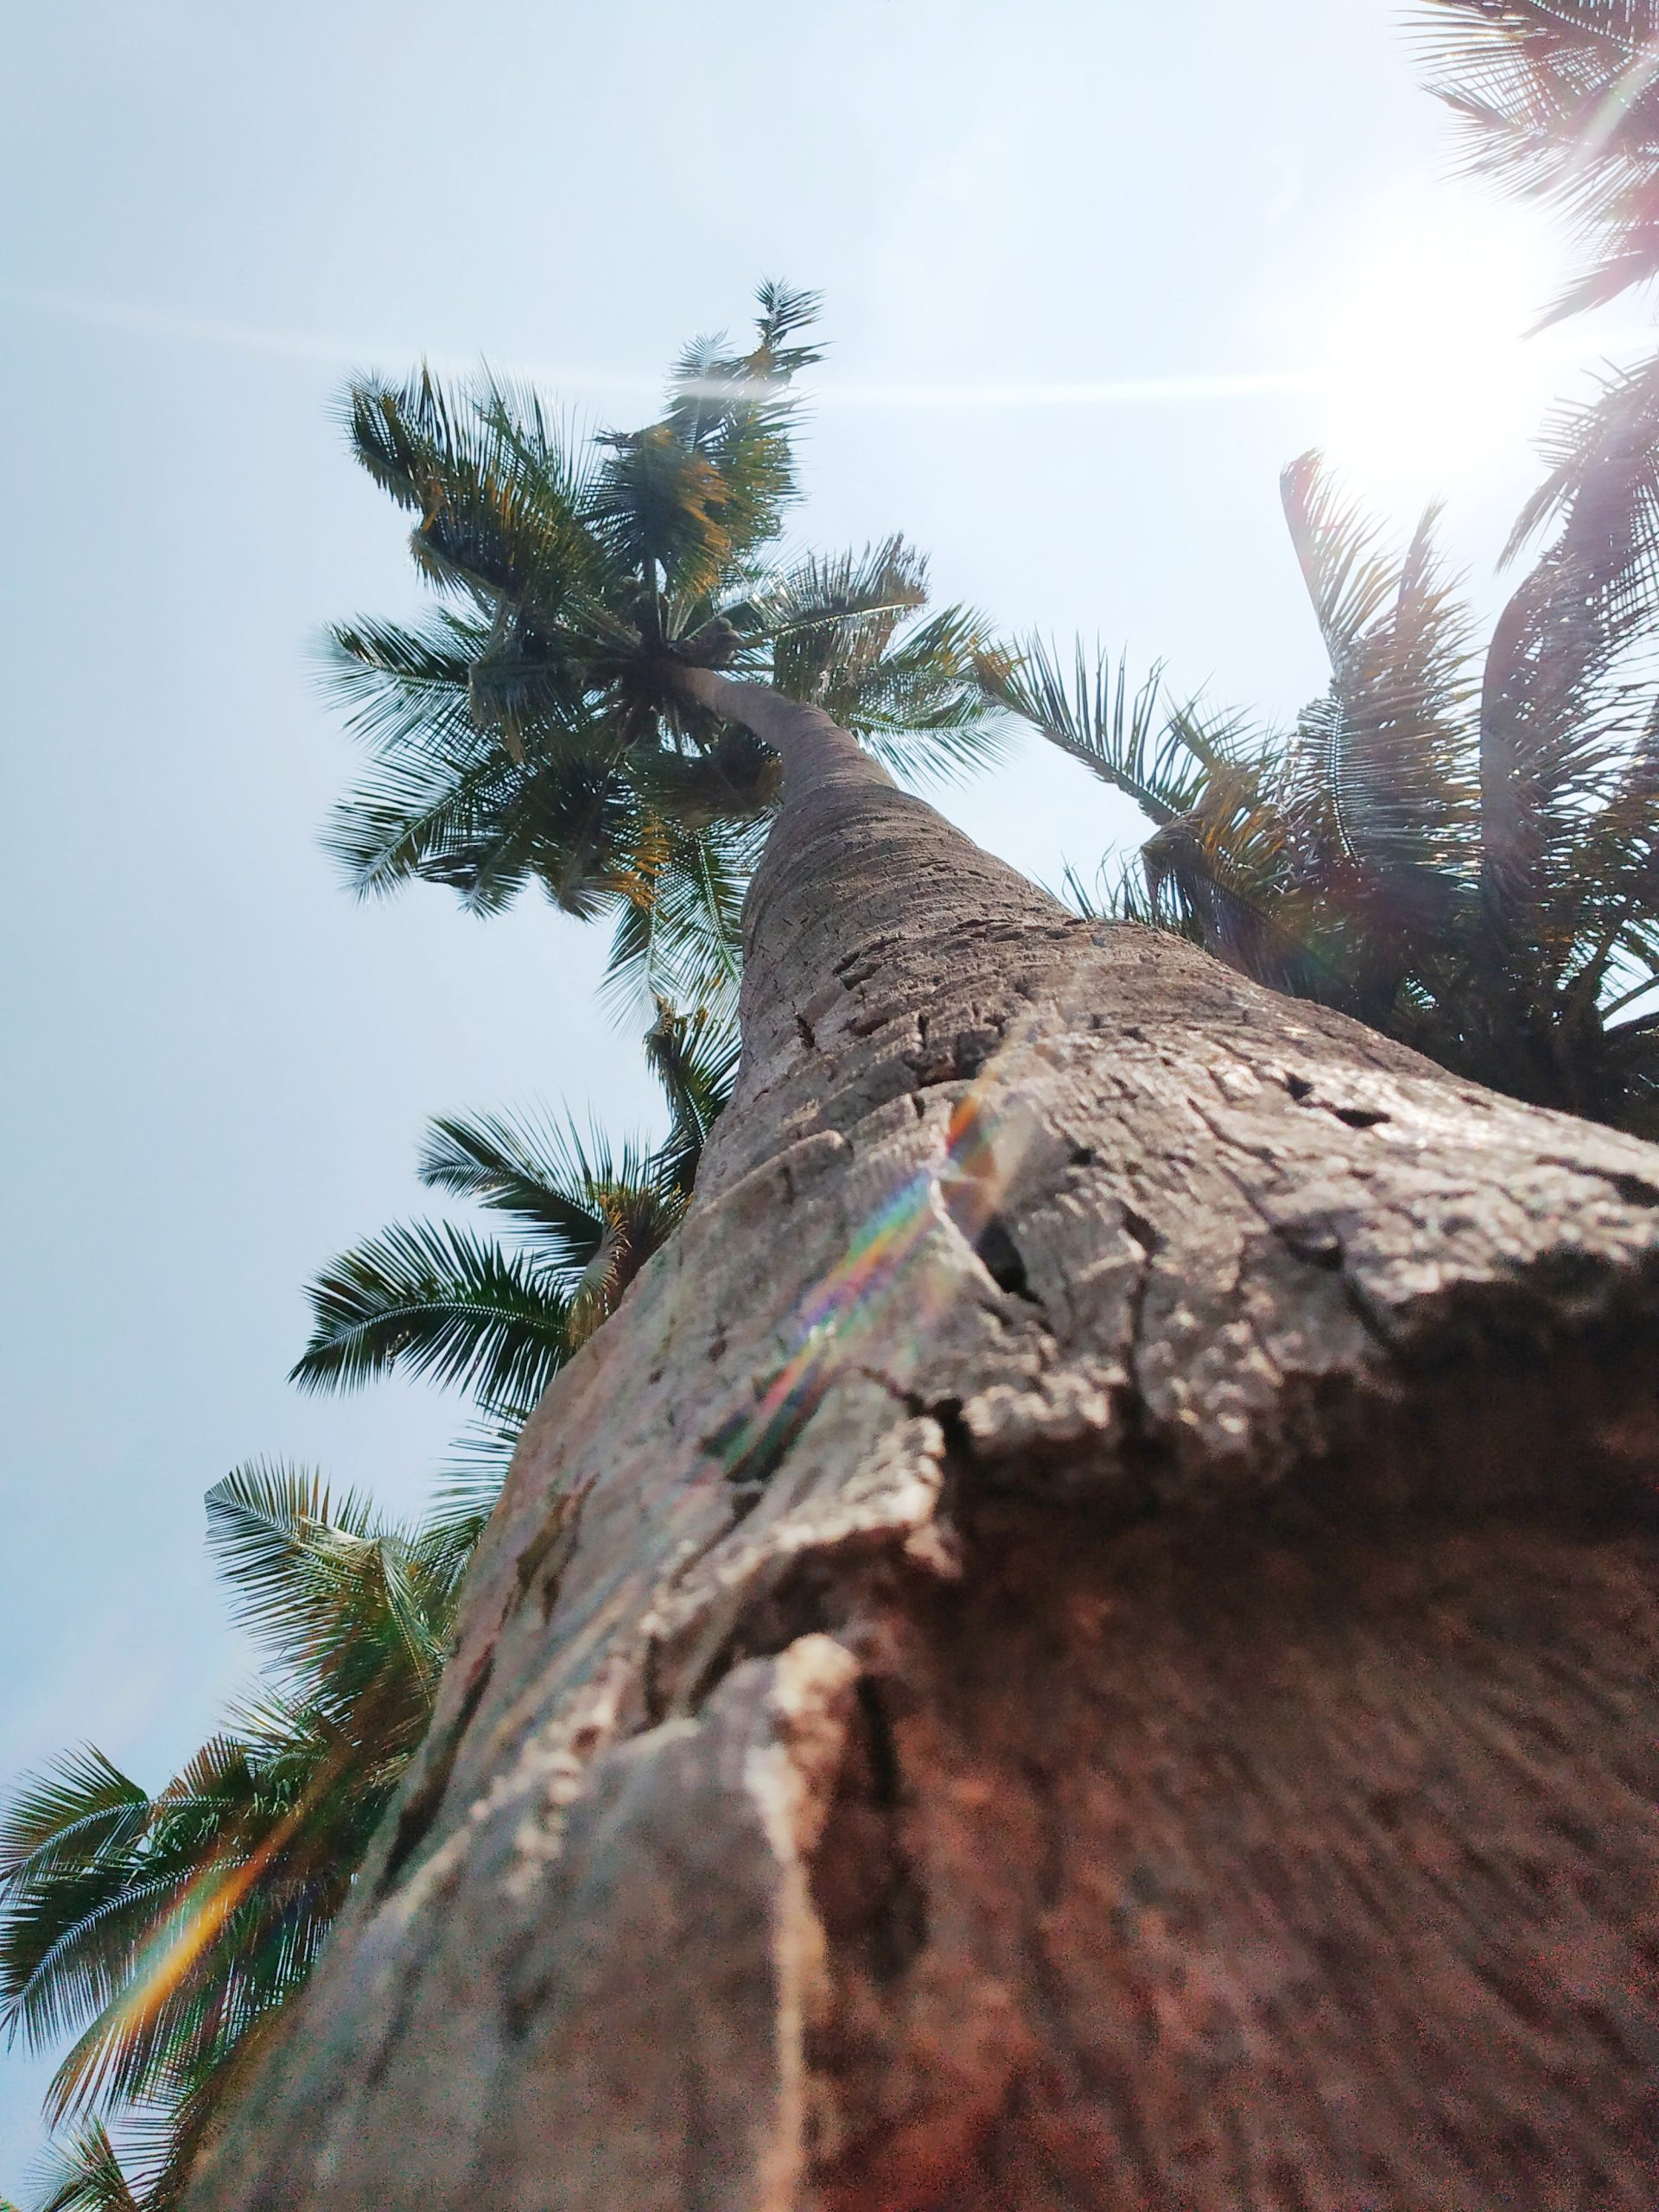 Coconut tree trunk